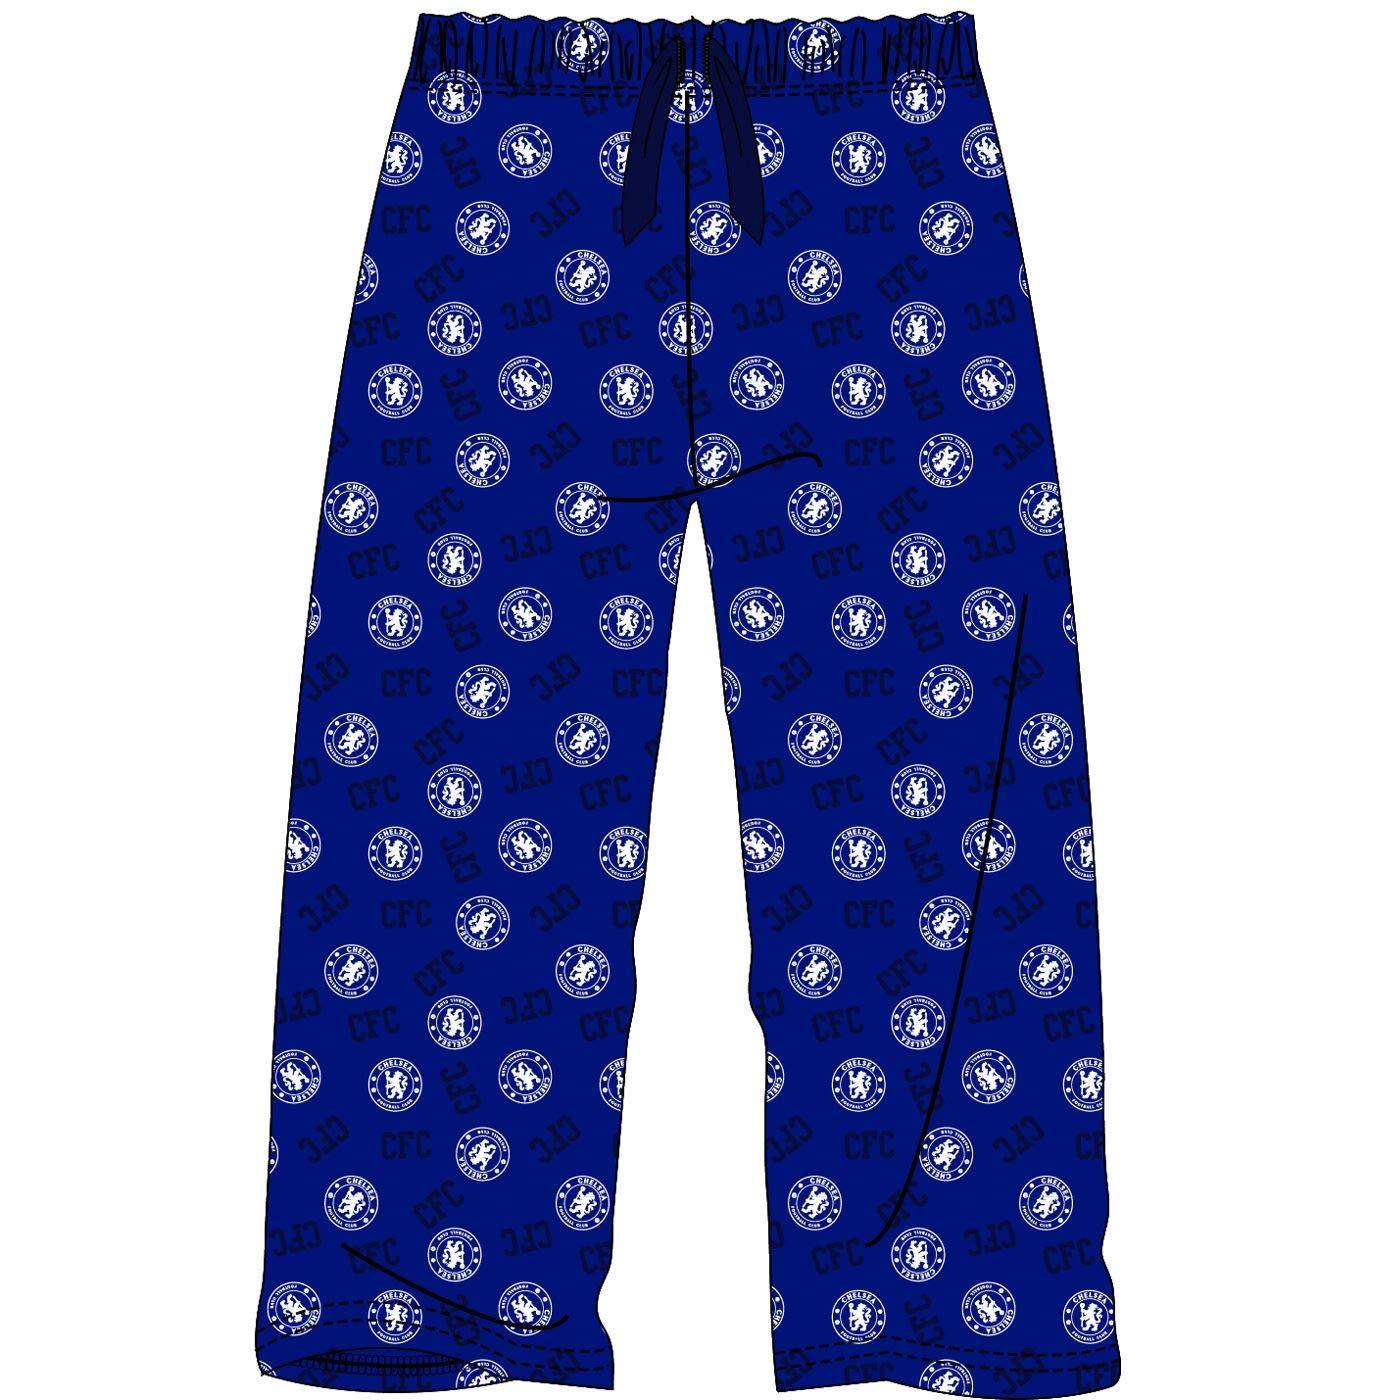 M Mens Chelsea Football Club Blue Lounge Pants Pyjama Bottoms Pyjamas Size S L XL